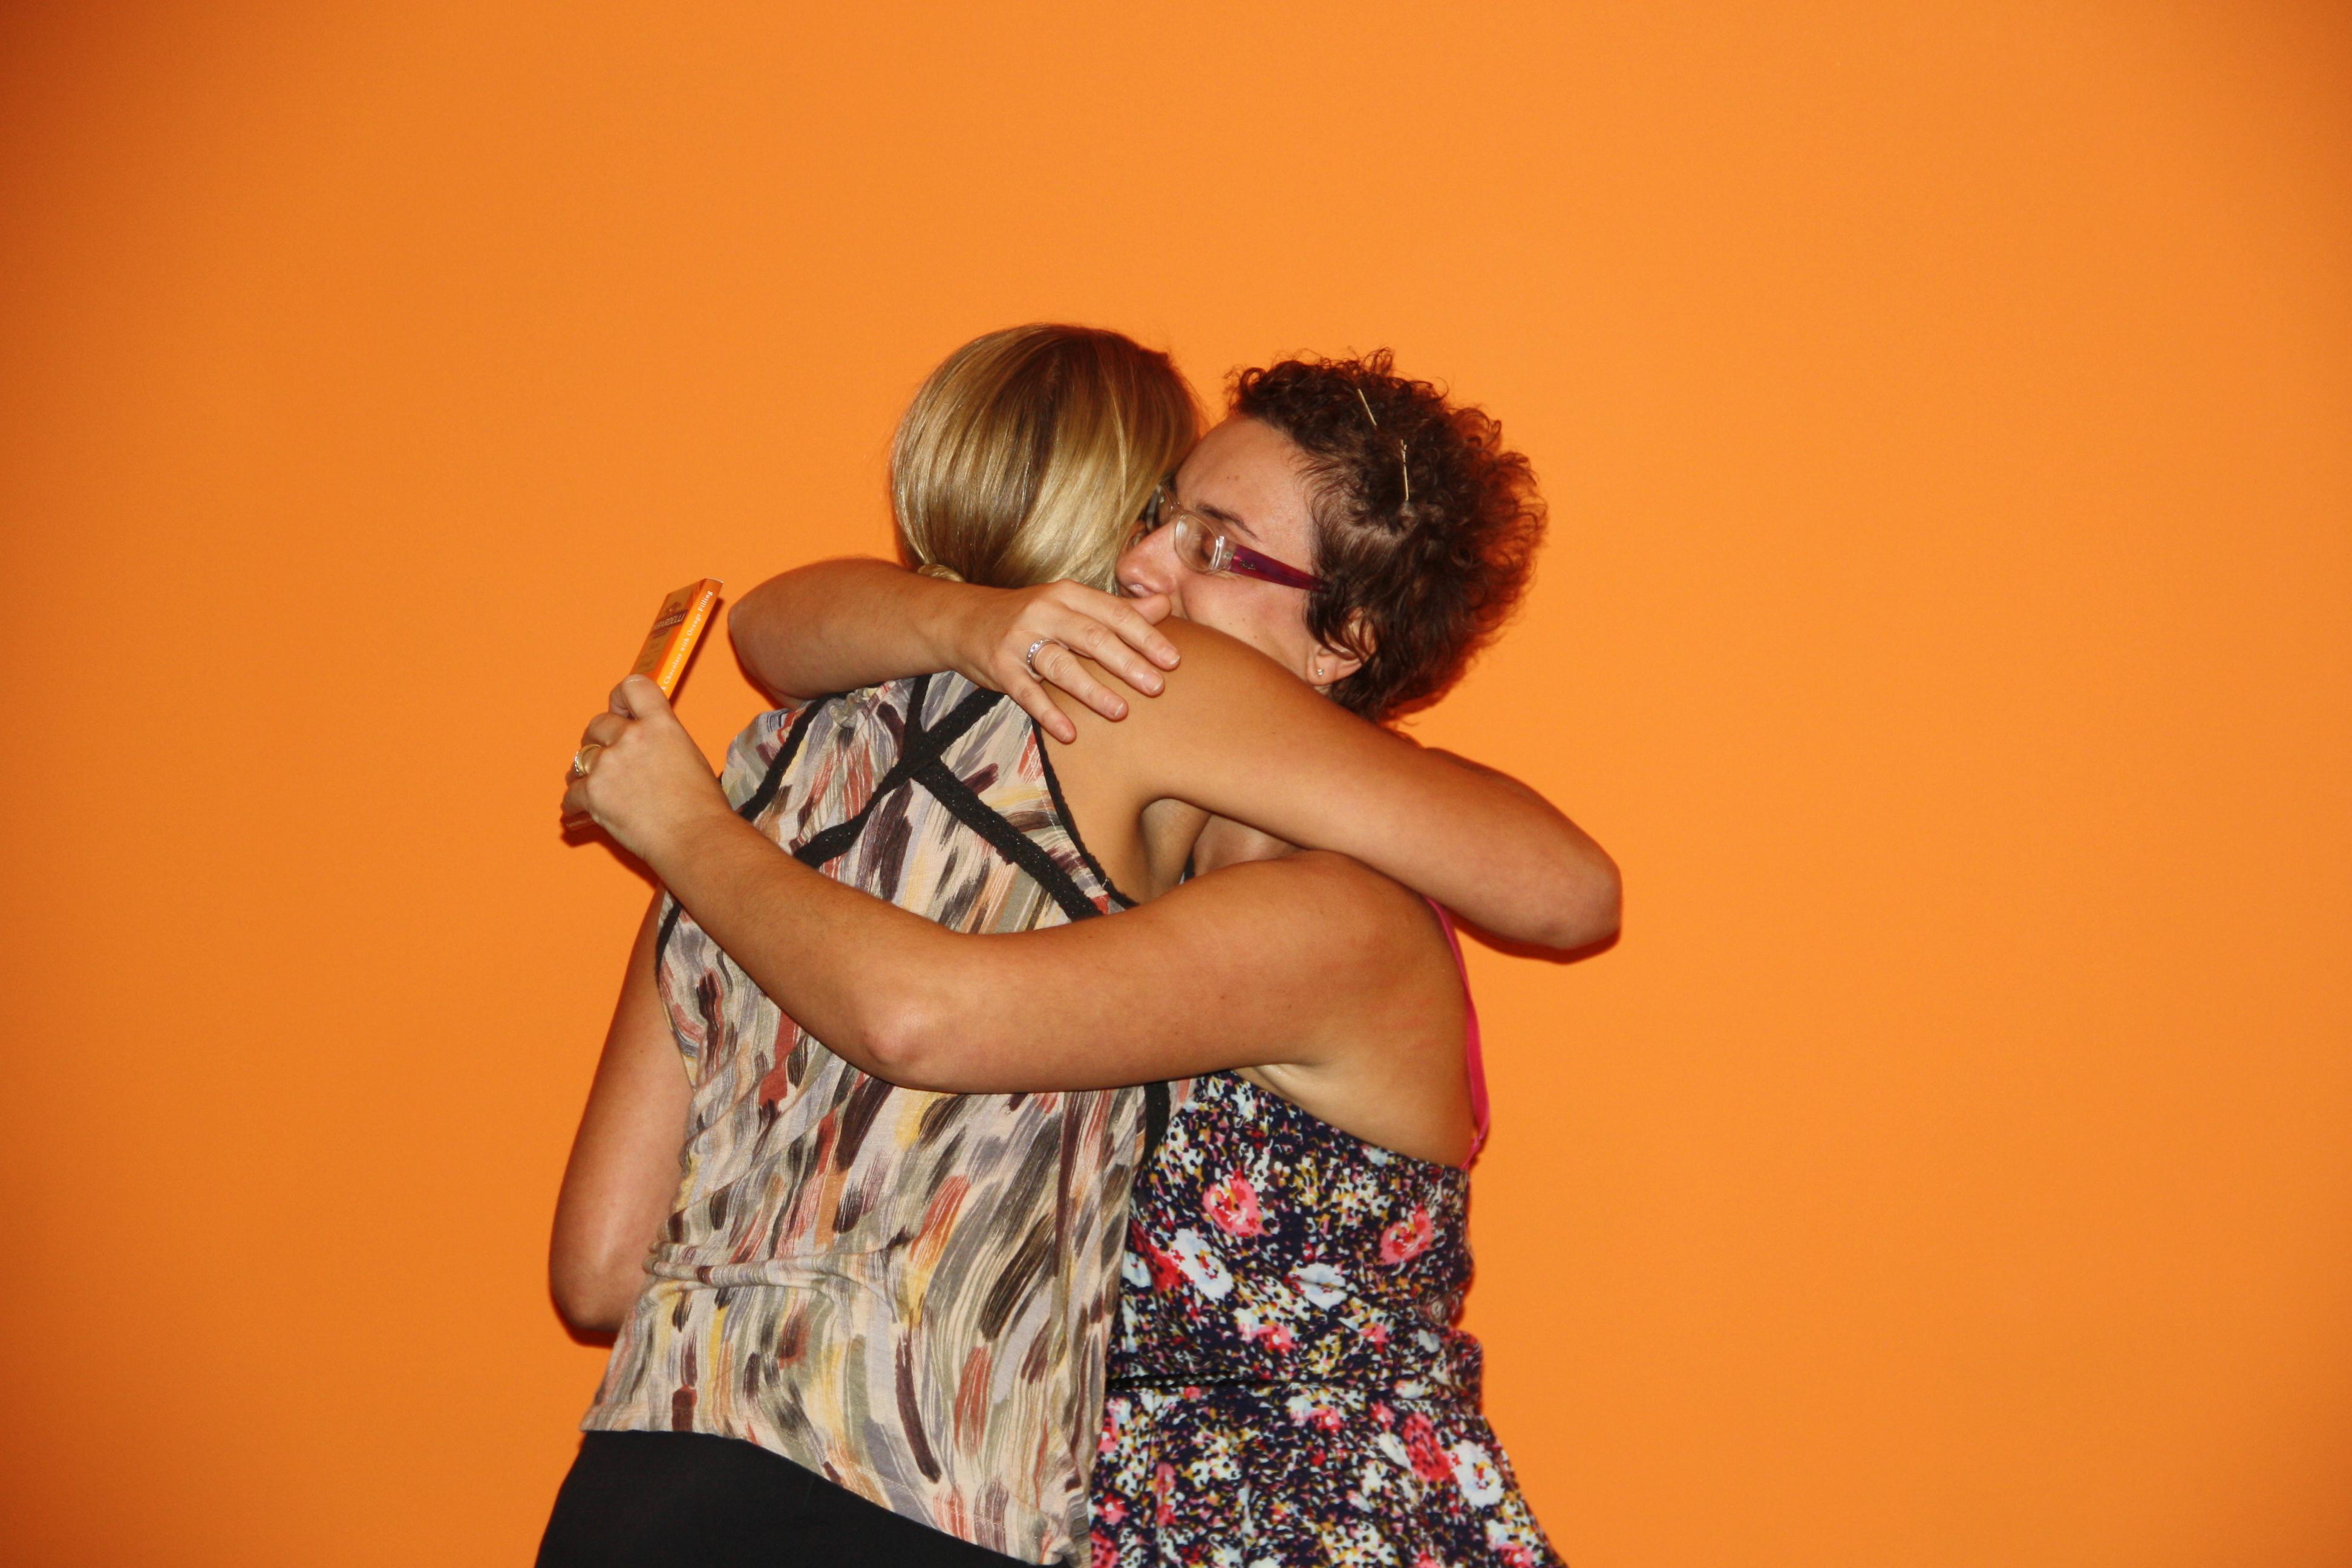 nicoletta hug